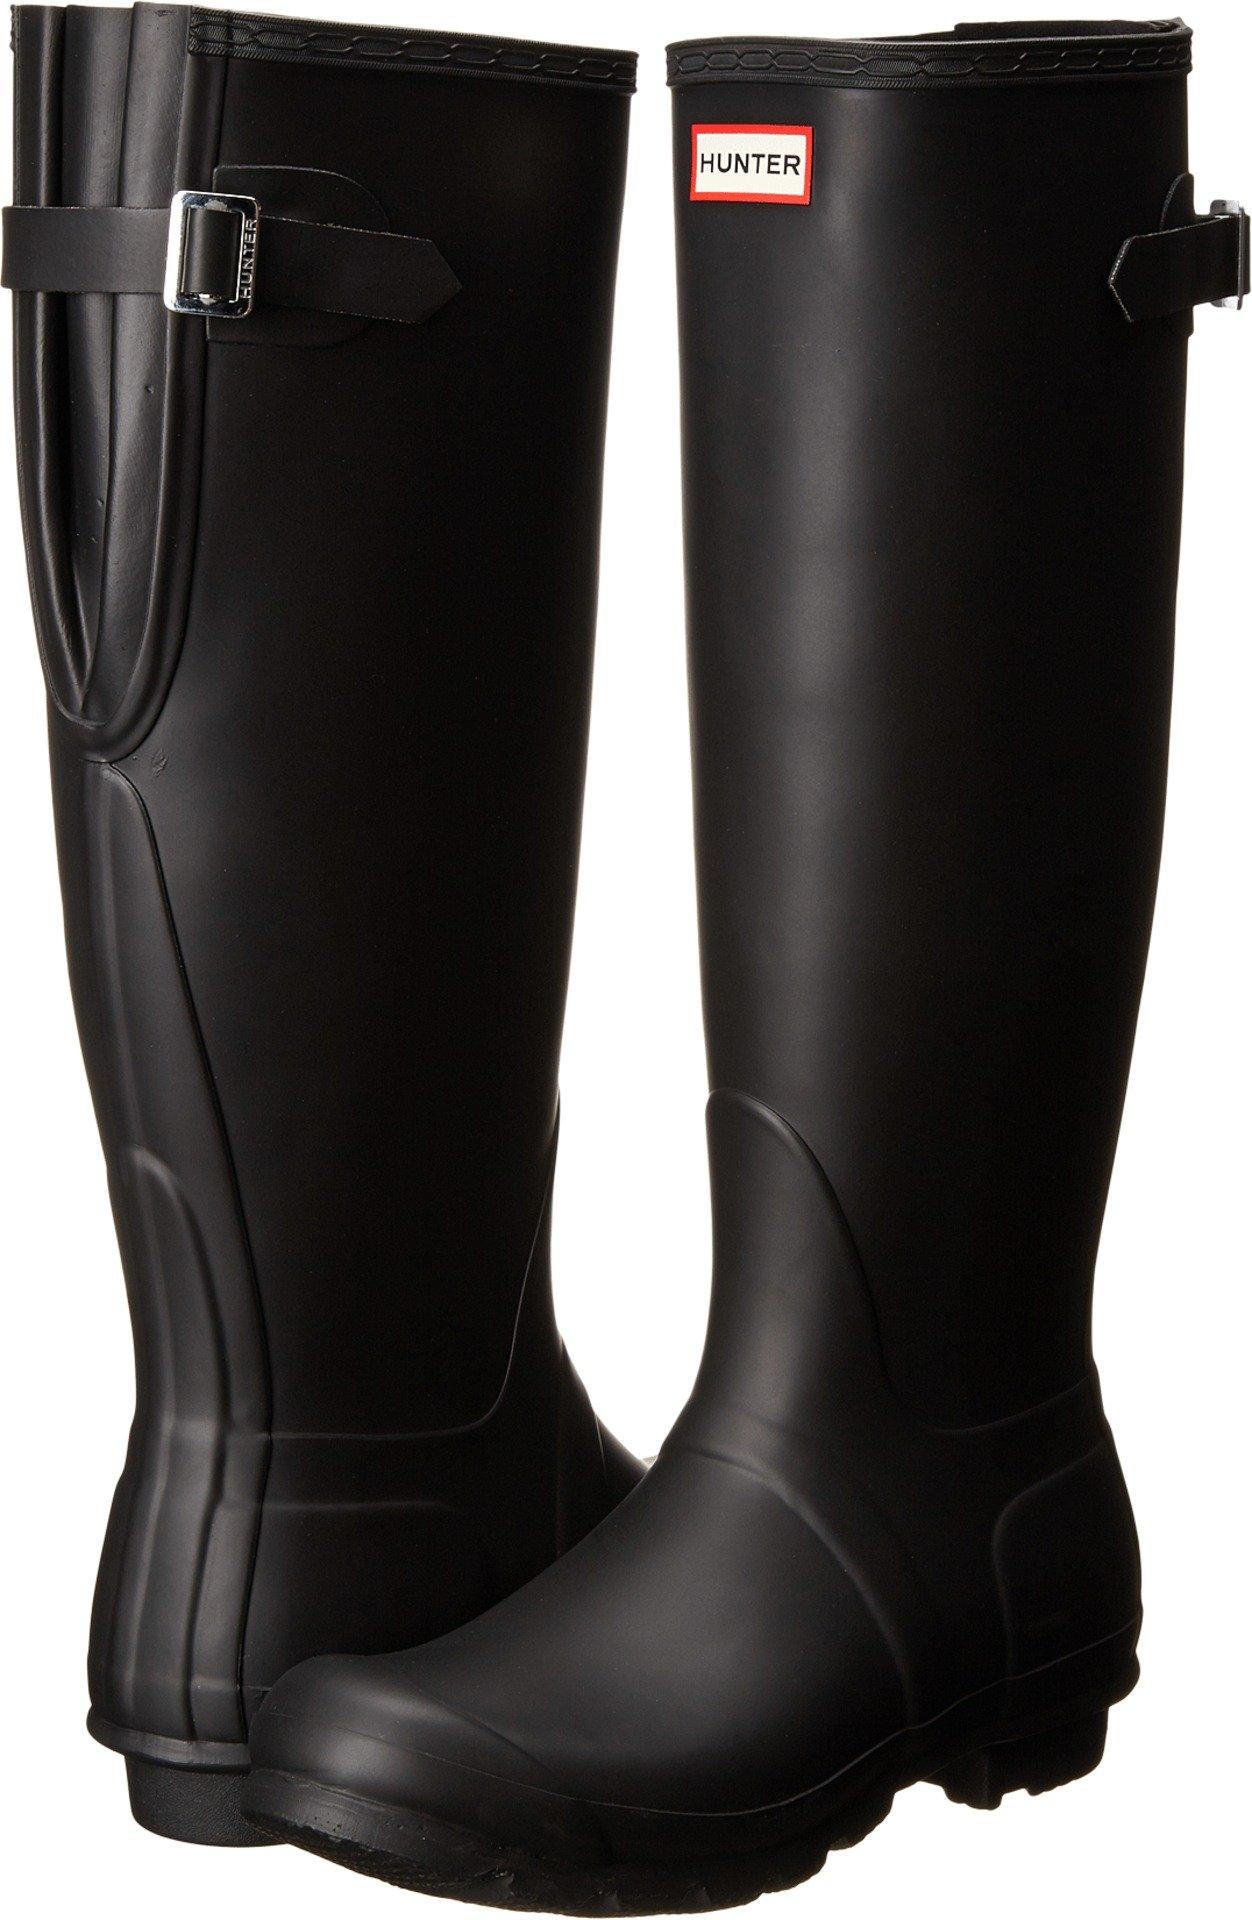 Hunter Women's Original Back Adjustable Rain Boots Black 8 M US